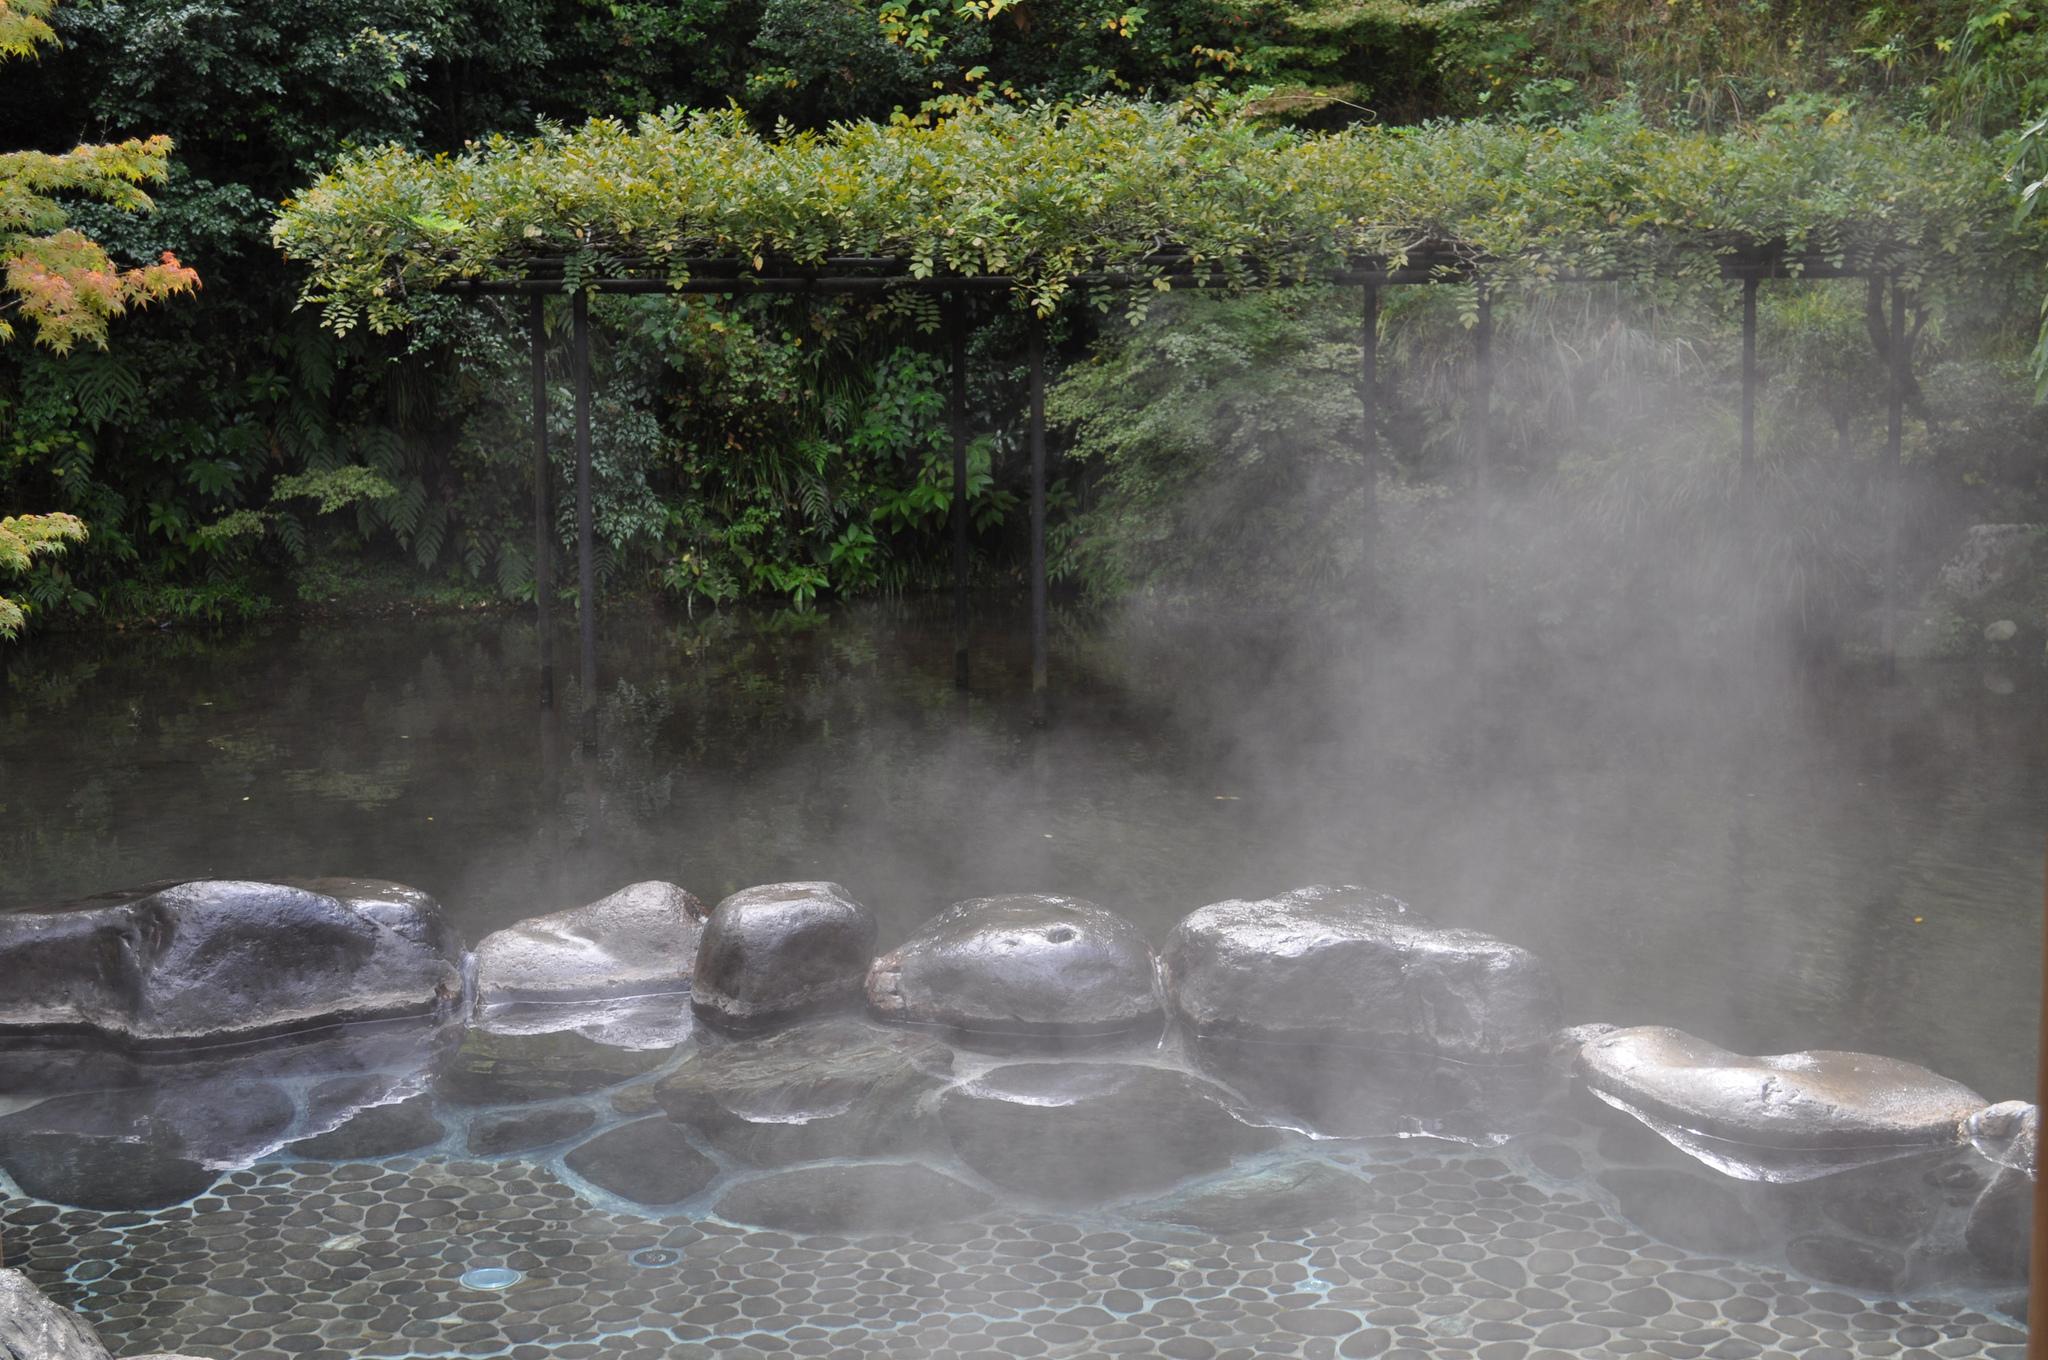 Bargain Bathing: Onsen in Tokyo